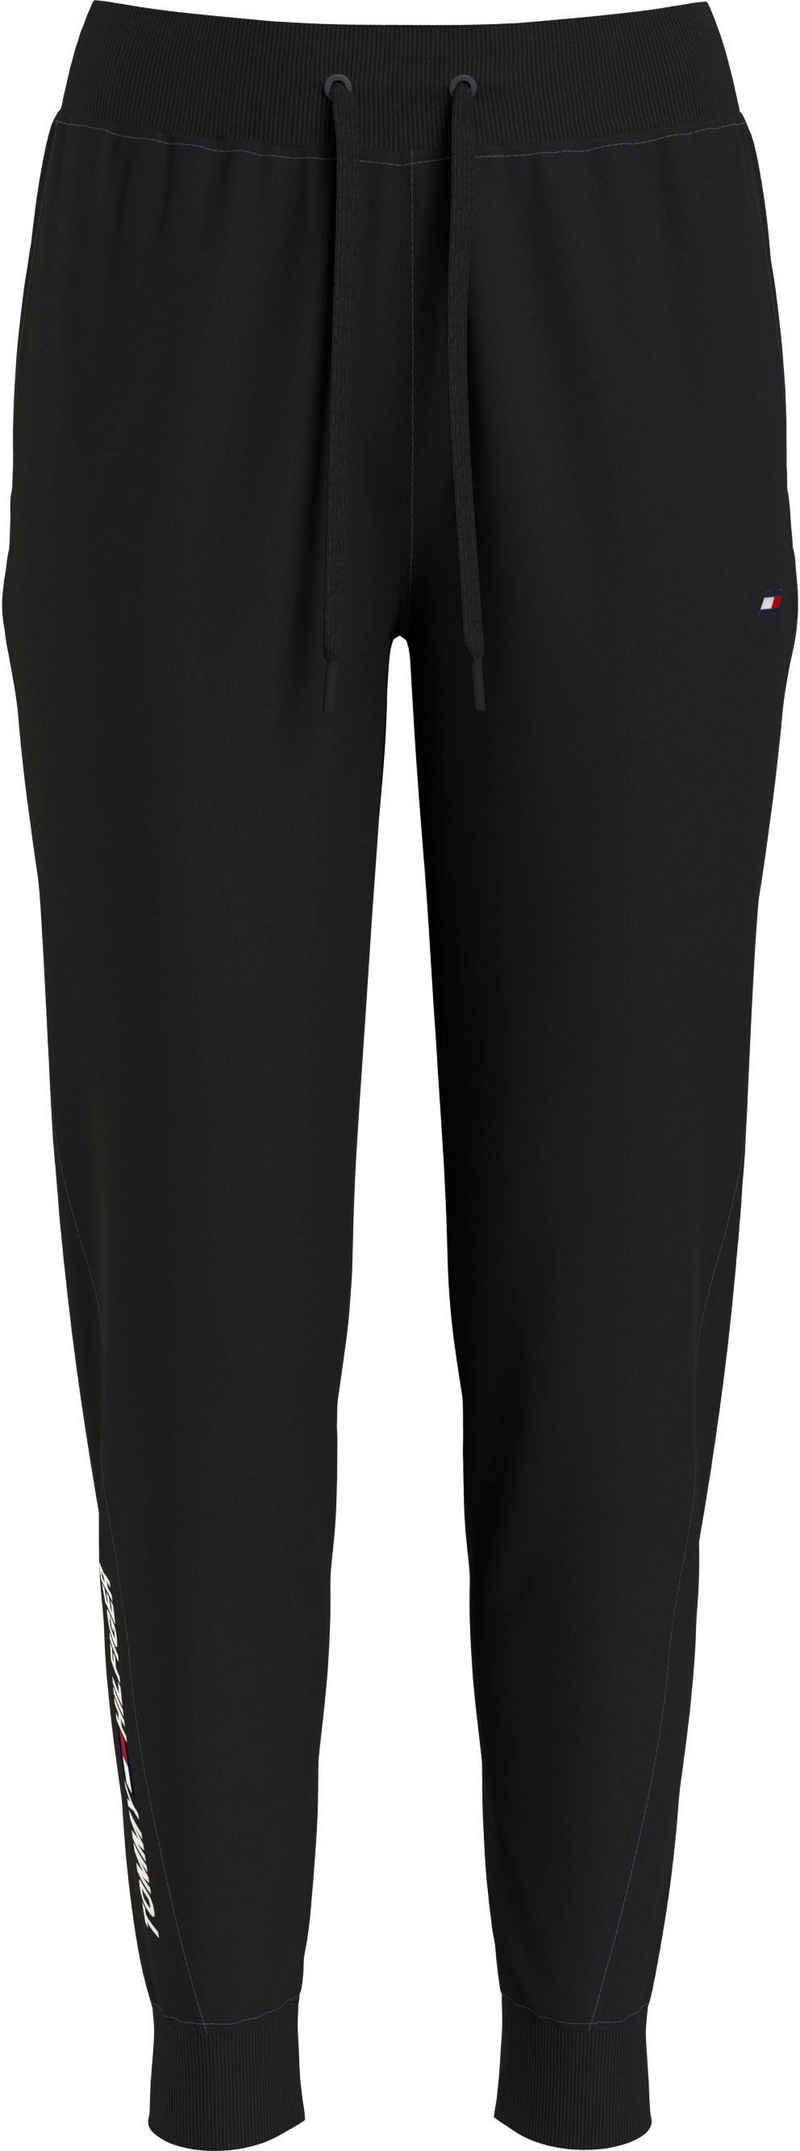 Tommy Hilfiger Sport Jogginghose »REGULAR GRAPHIC PANT« mit seitlichem Tommy Hilfiger Logo-Schriftzug